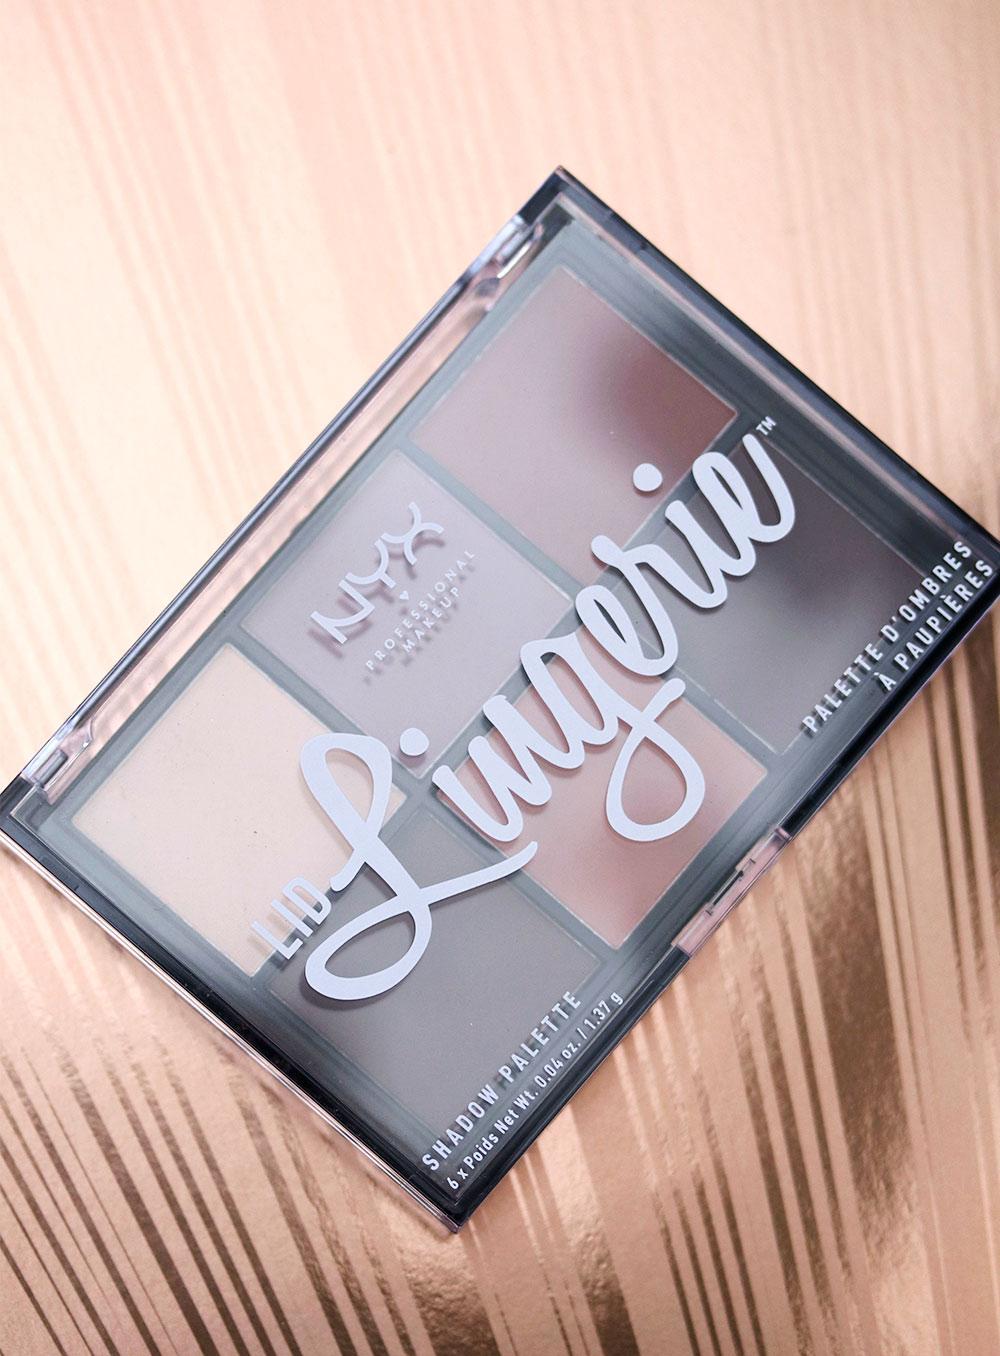 nyx lid lingerie packaging